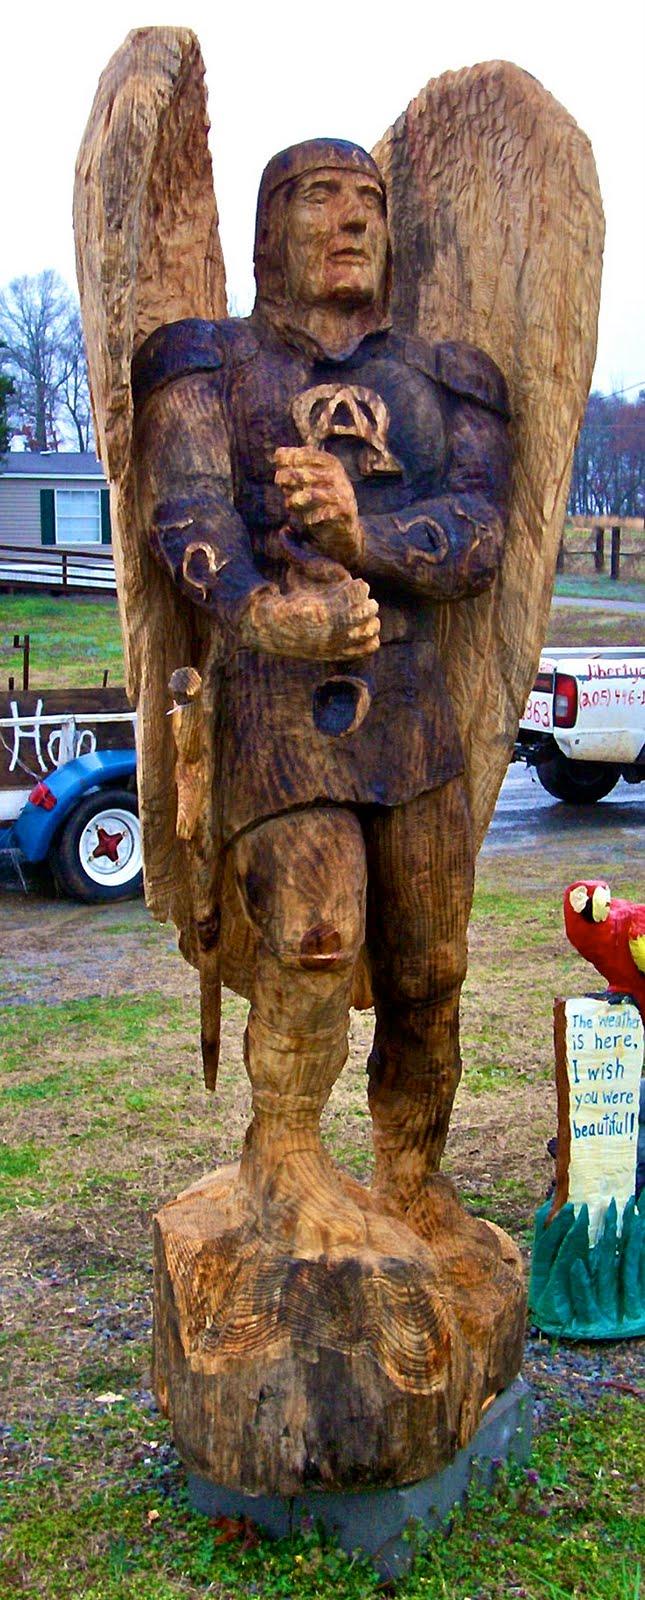 Ptldme chainsaw sculpture